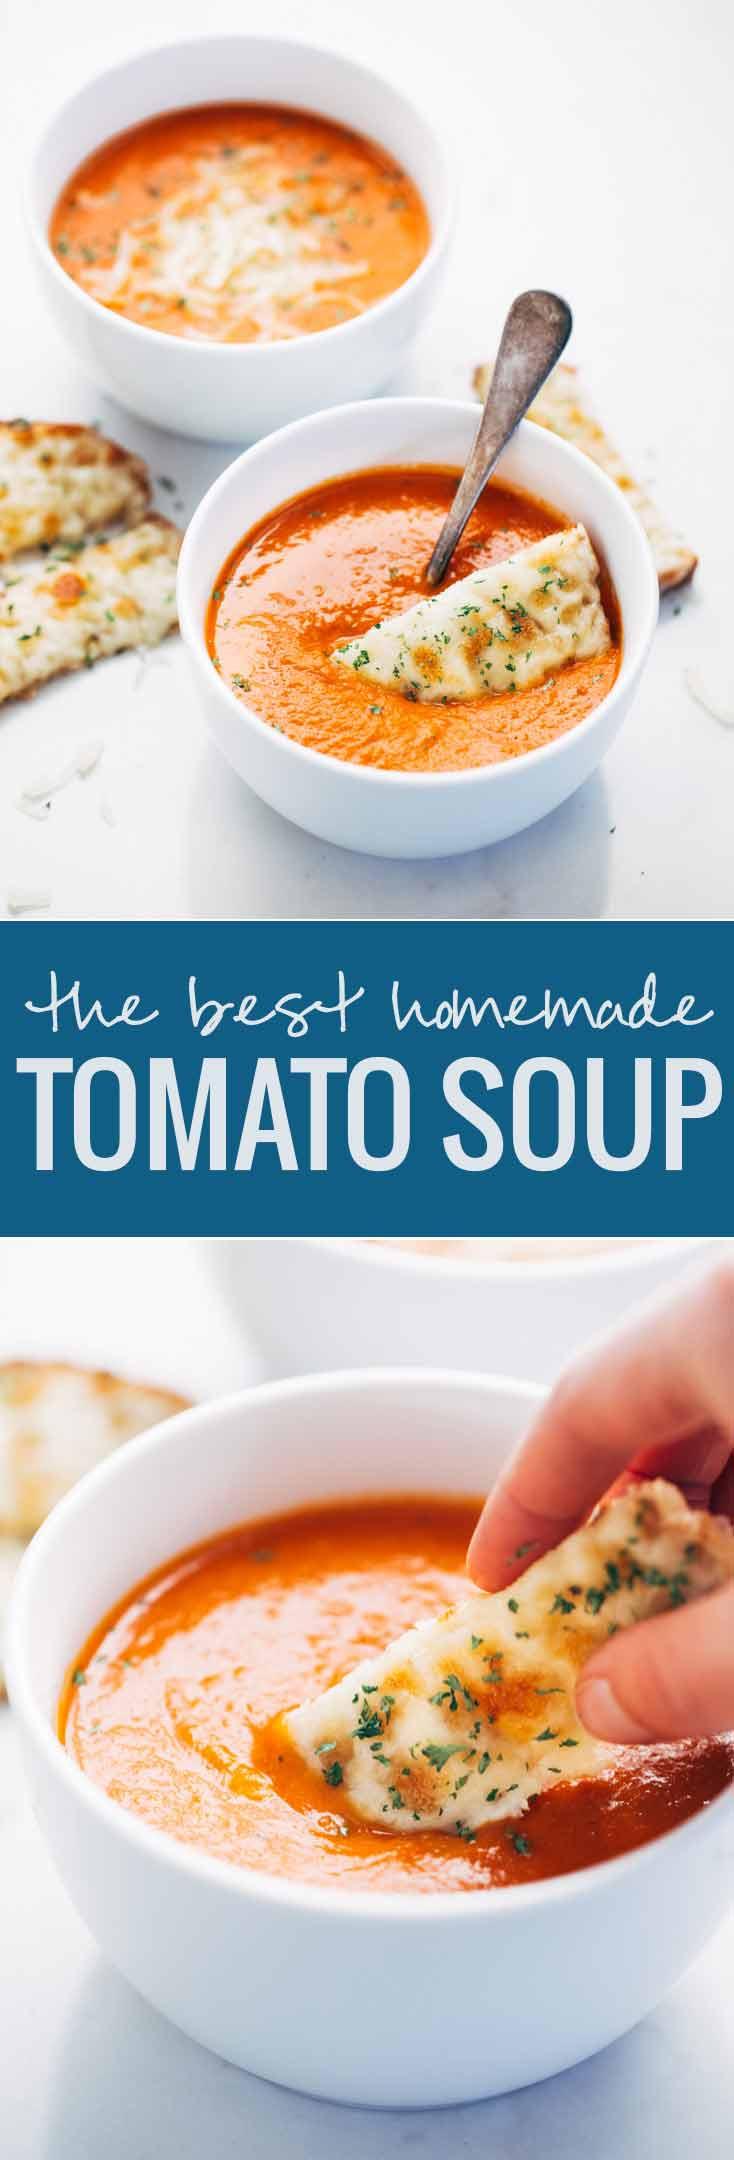 Homemade Tomato Soup Recipe  Simple Homemade Tomato Soup Recipe Pinch of Yum